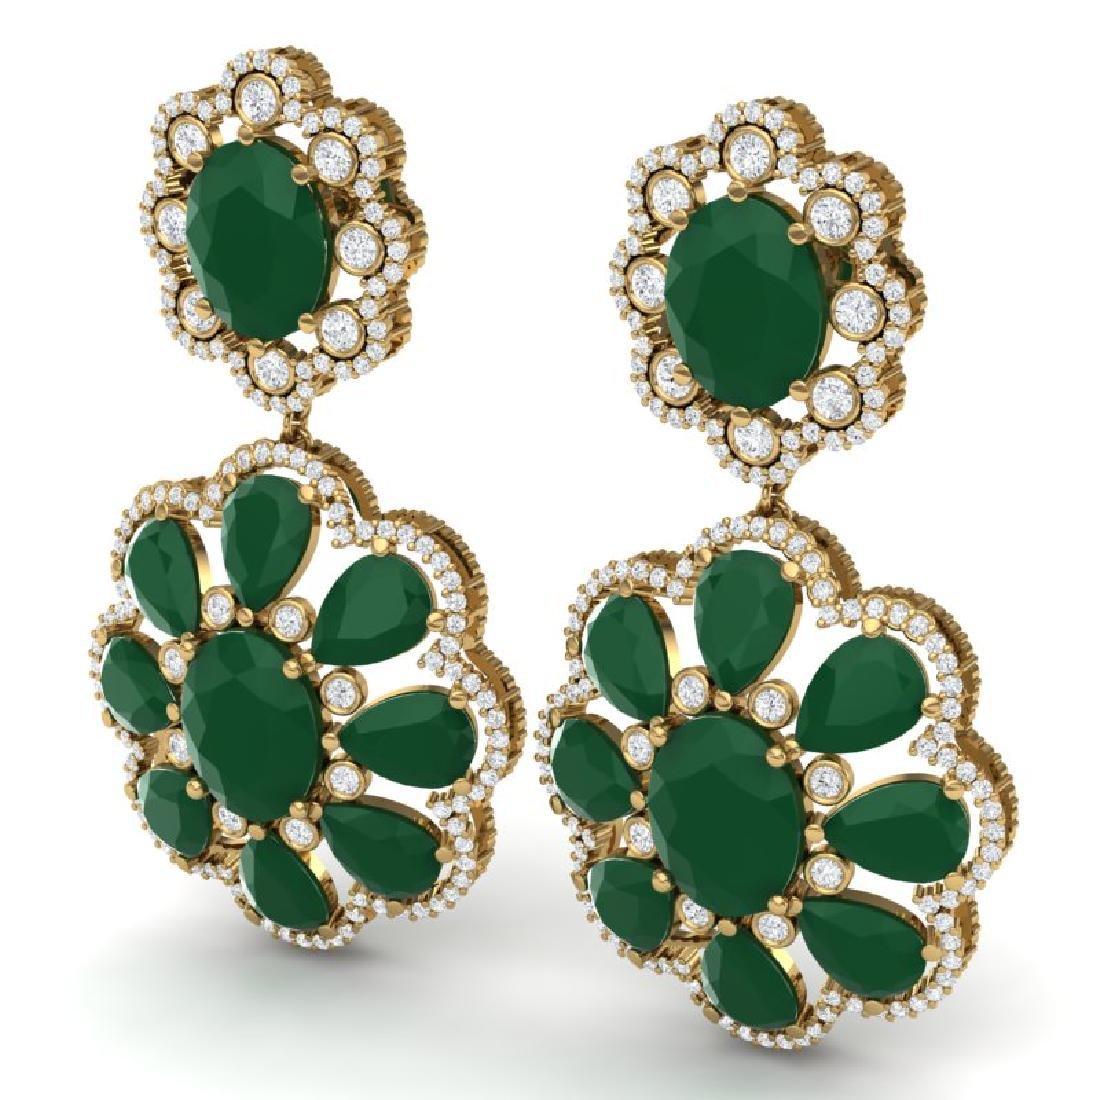 33.88 CTW Royalty Emerald & VS Diamond Earrings 18K - 2